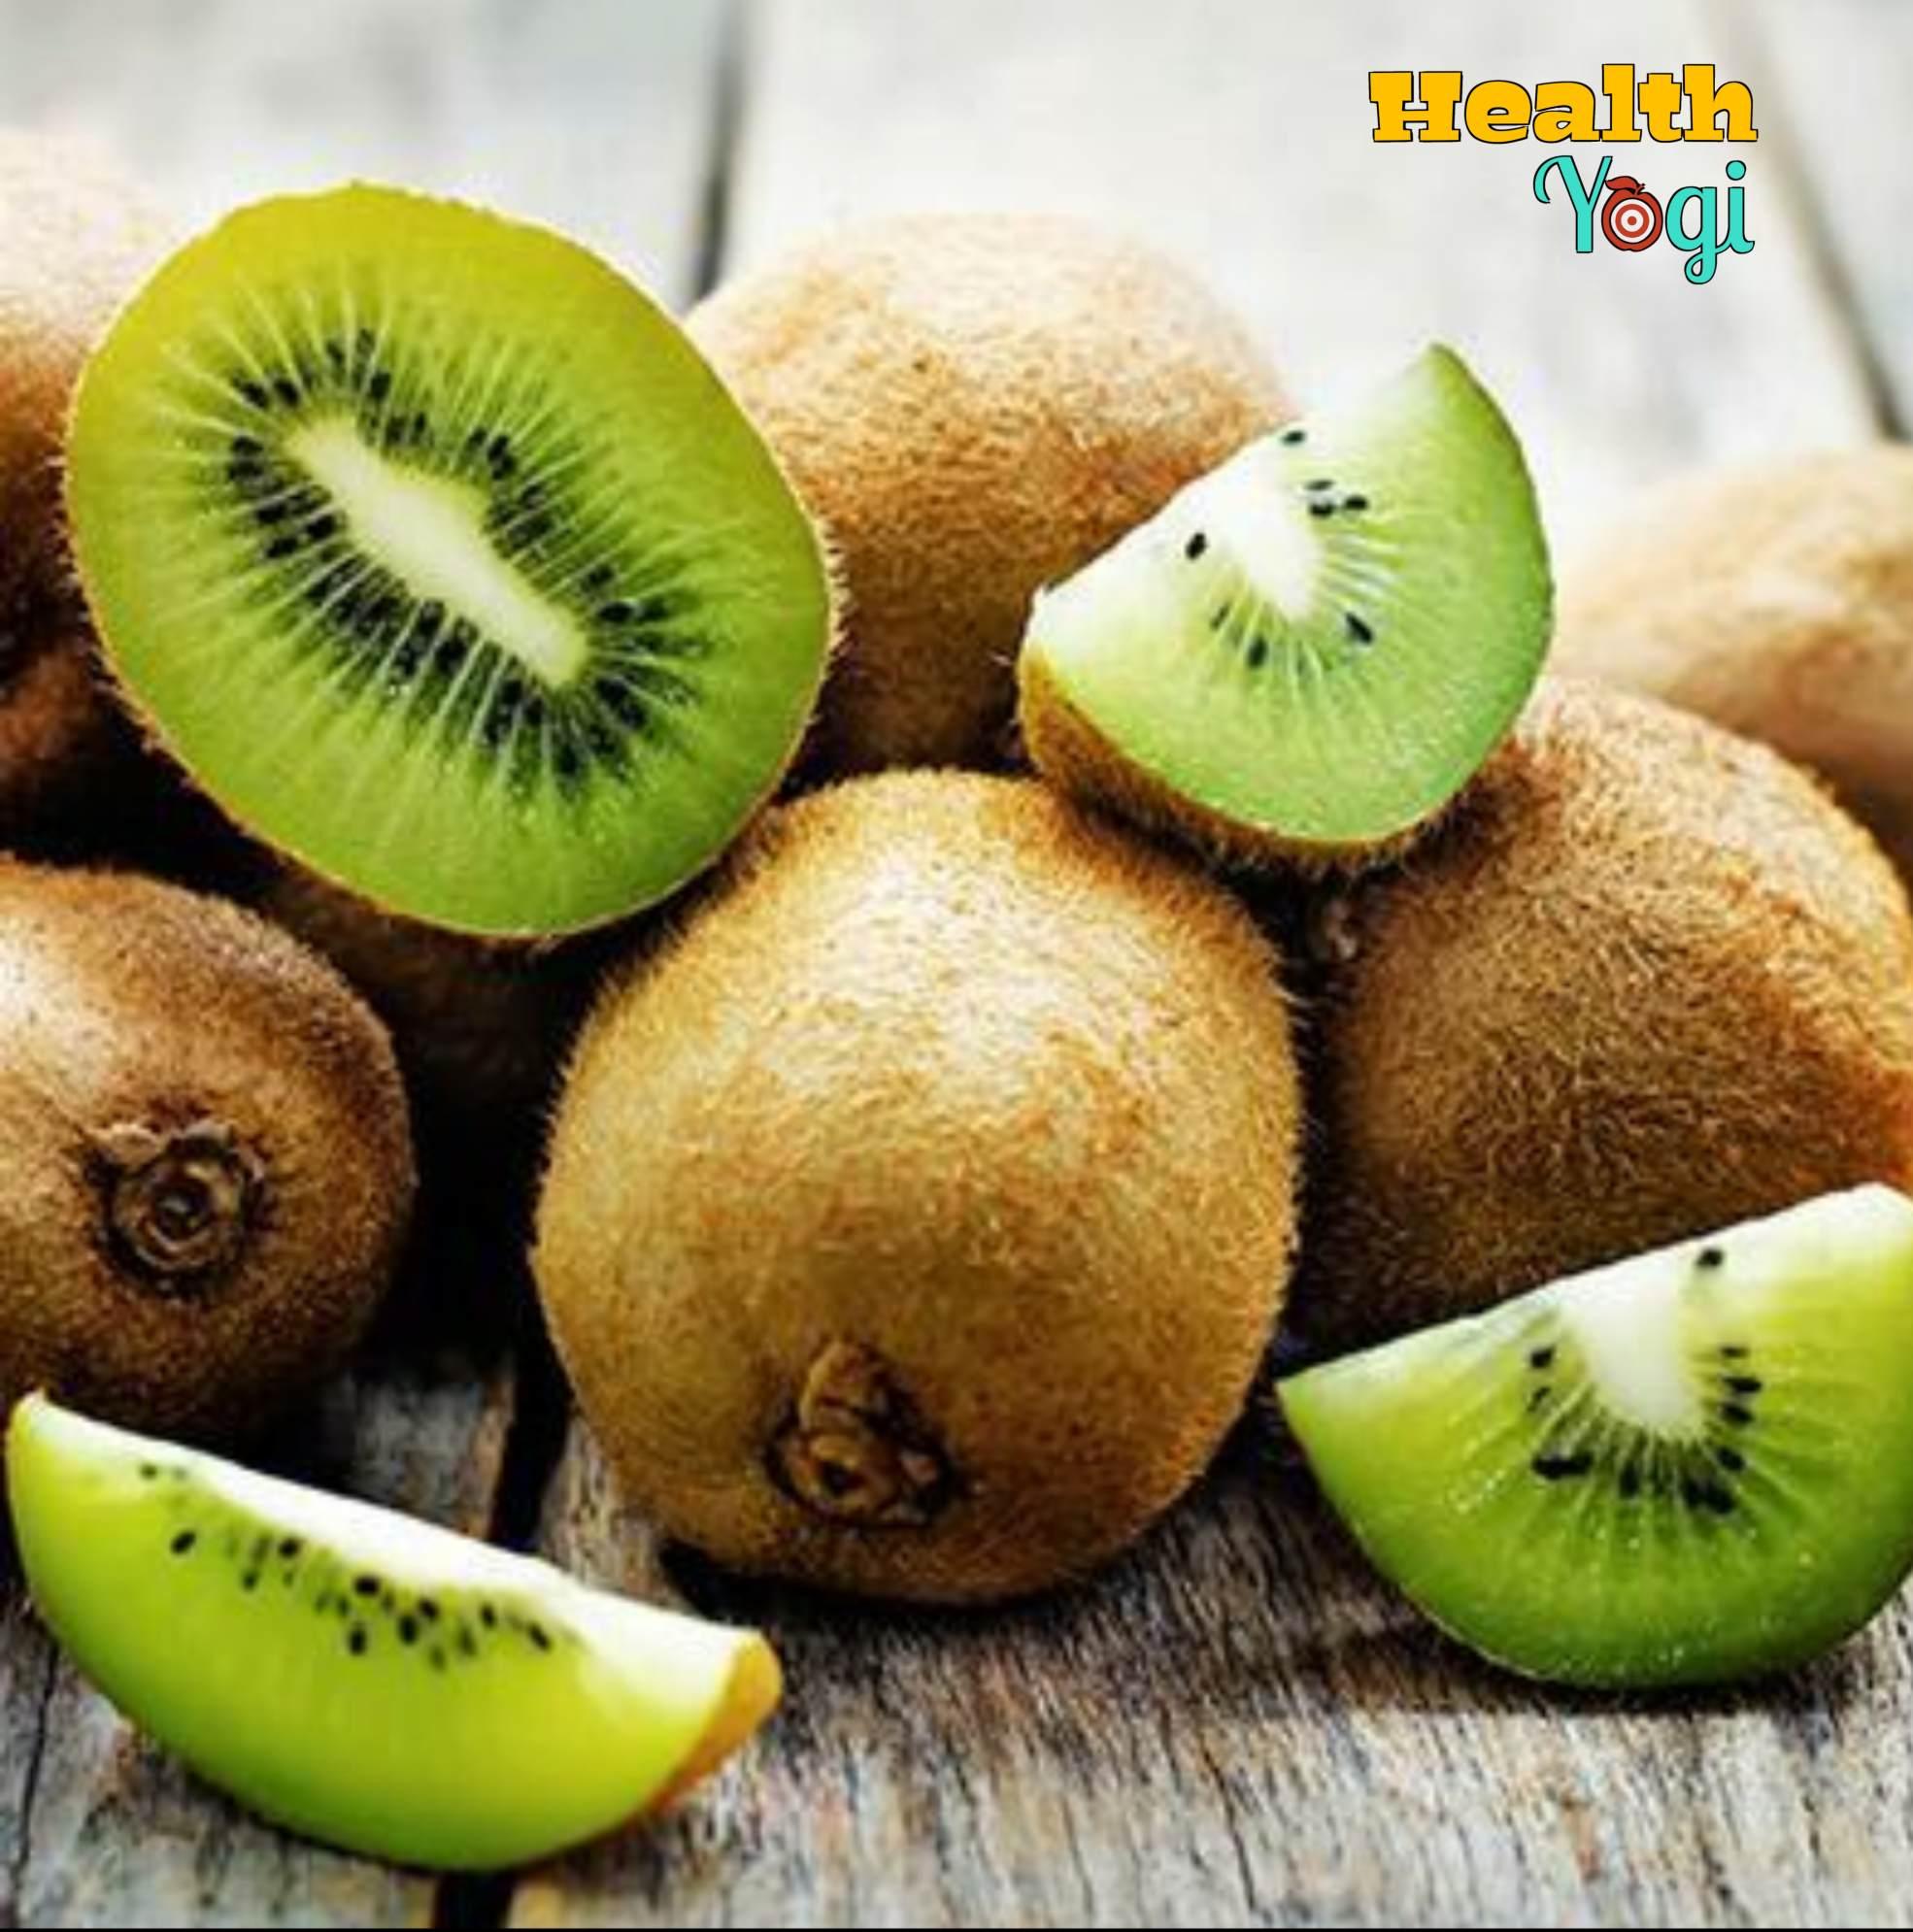 Kiwi Fruit Benefits For Skin | Is Kiwi Good For Pimples?